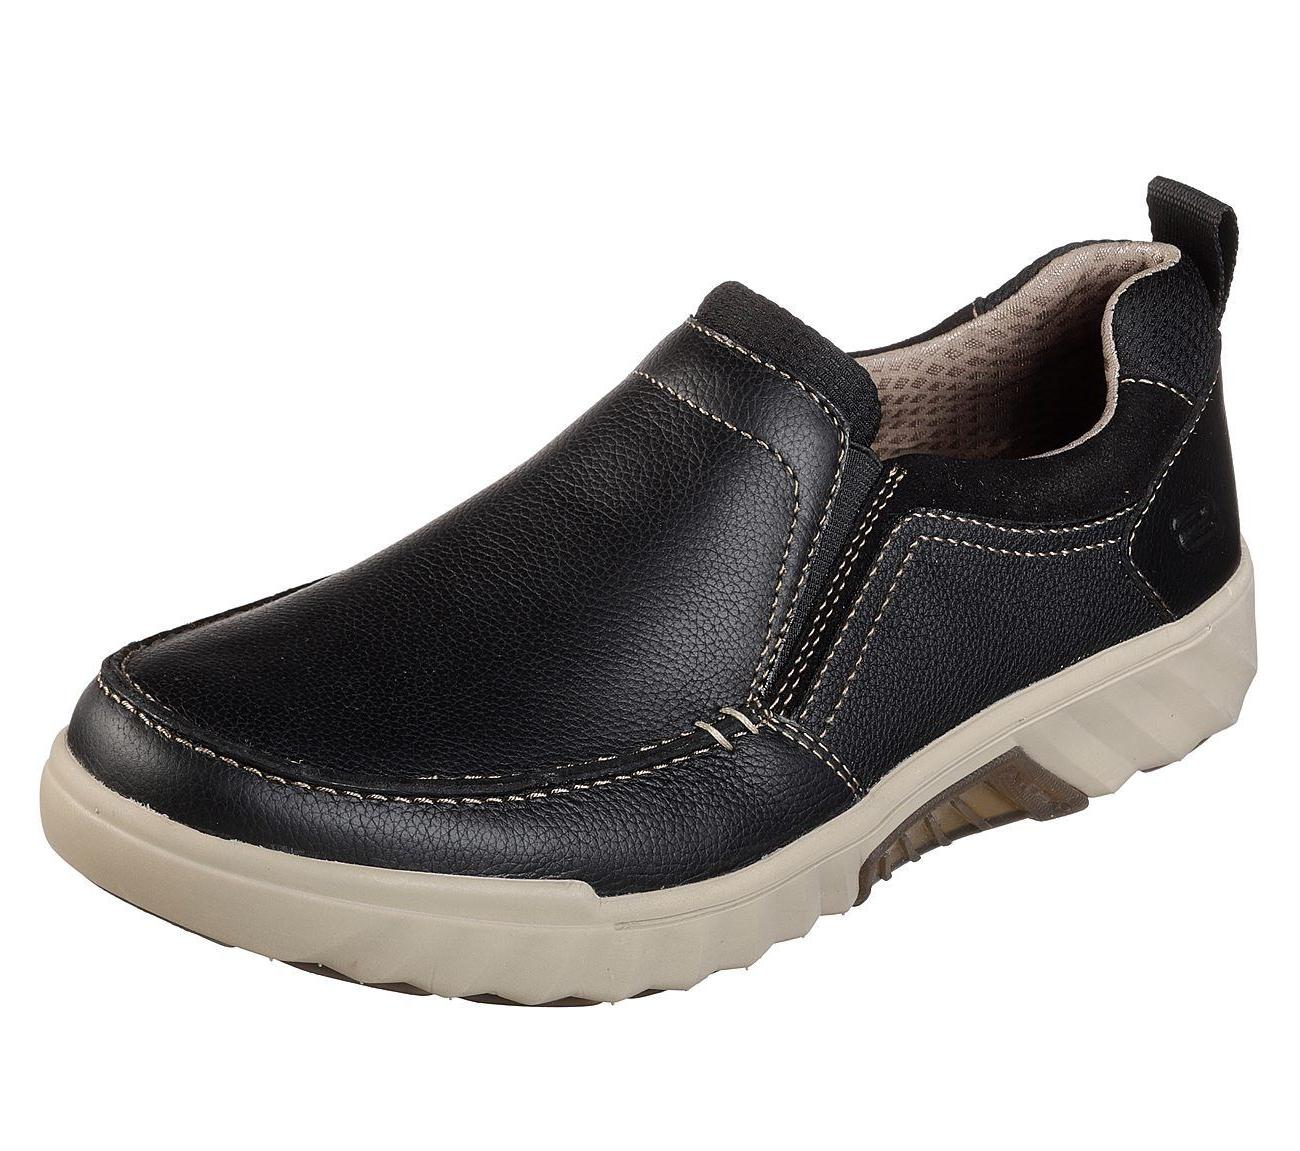 65745 Black Skechers shoes Men Memory Foam Slip On Comfort L